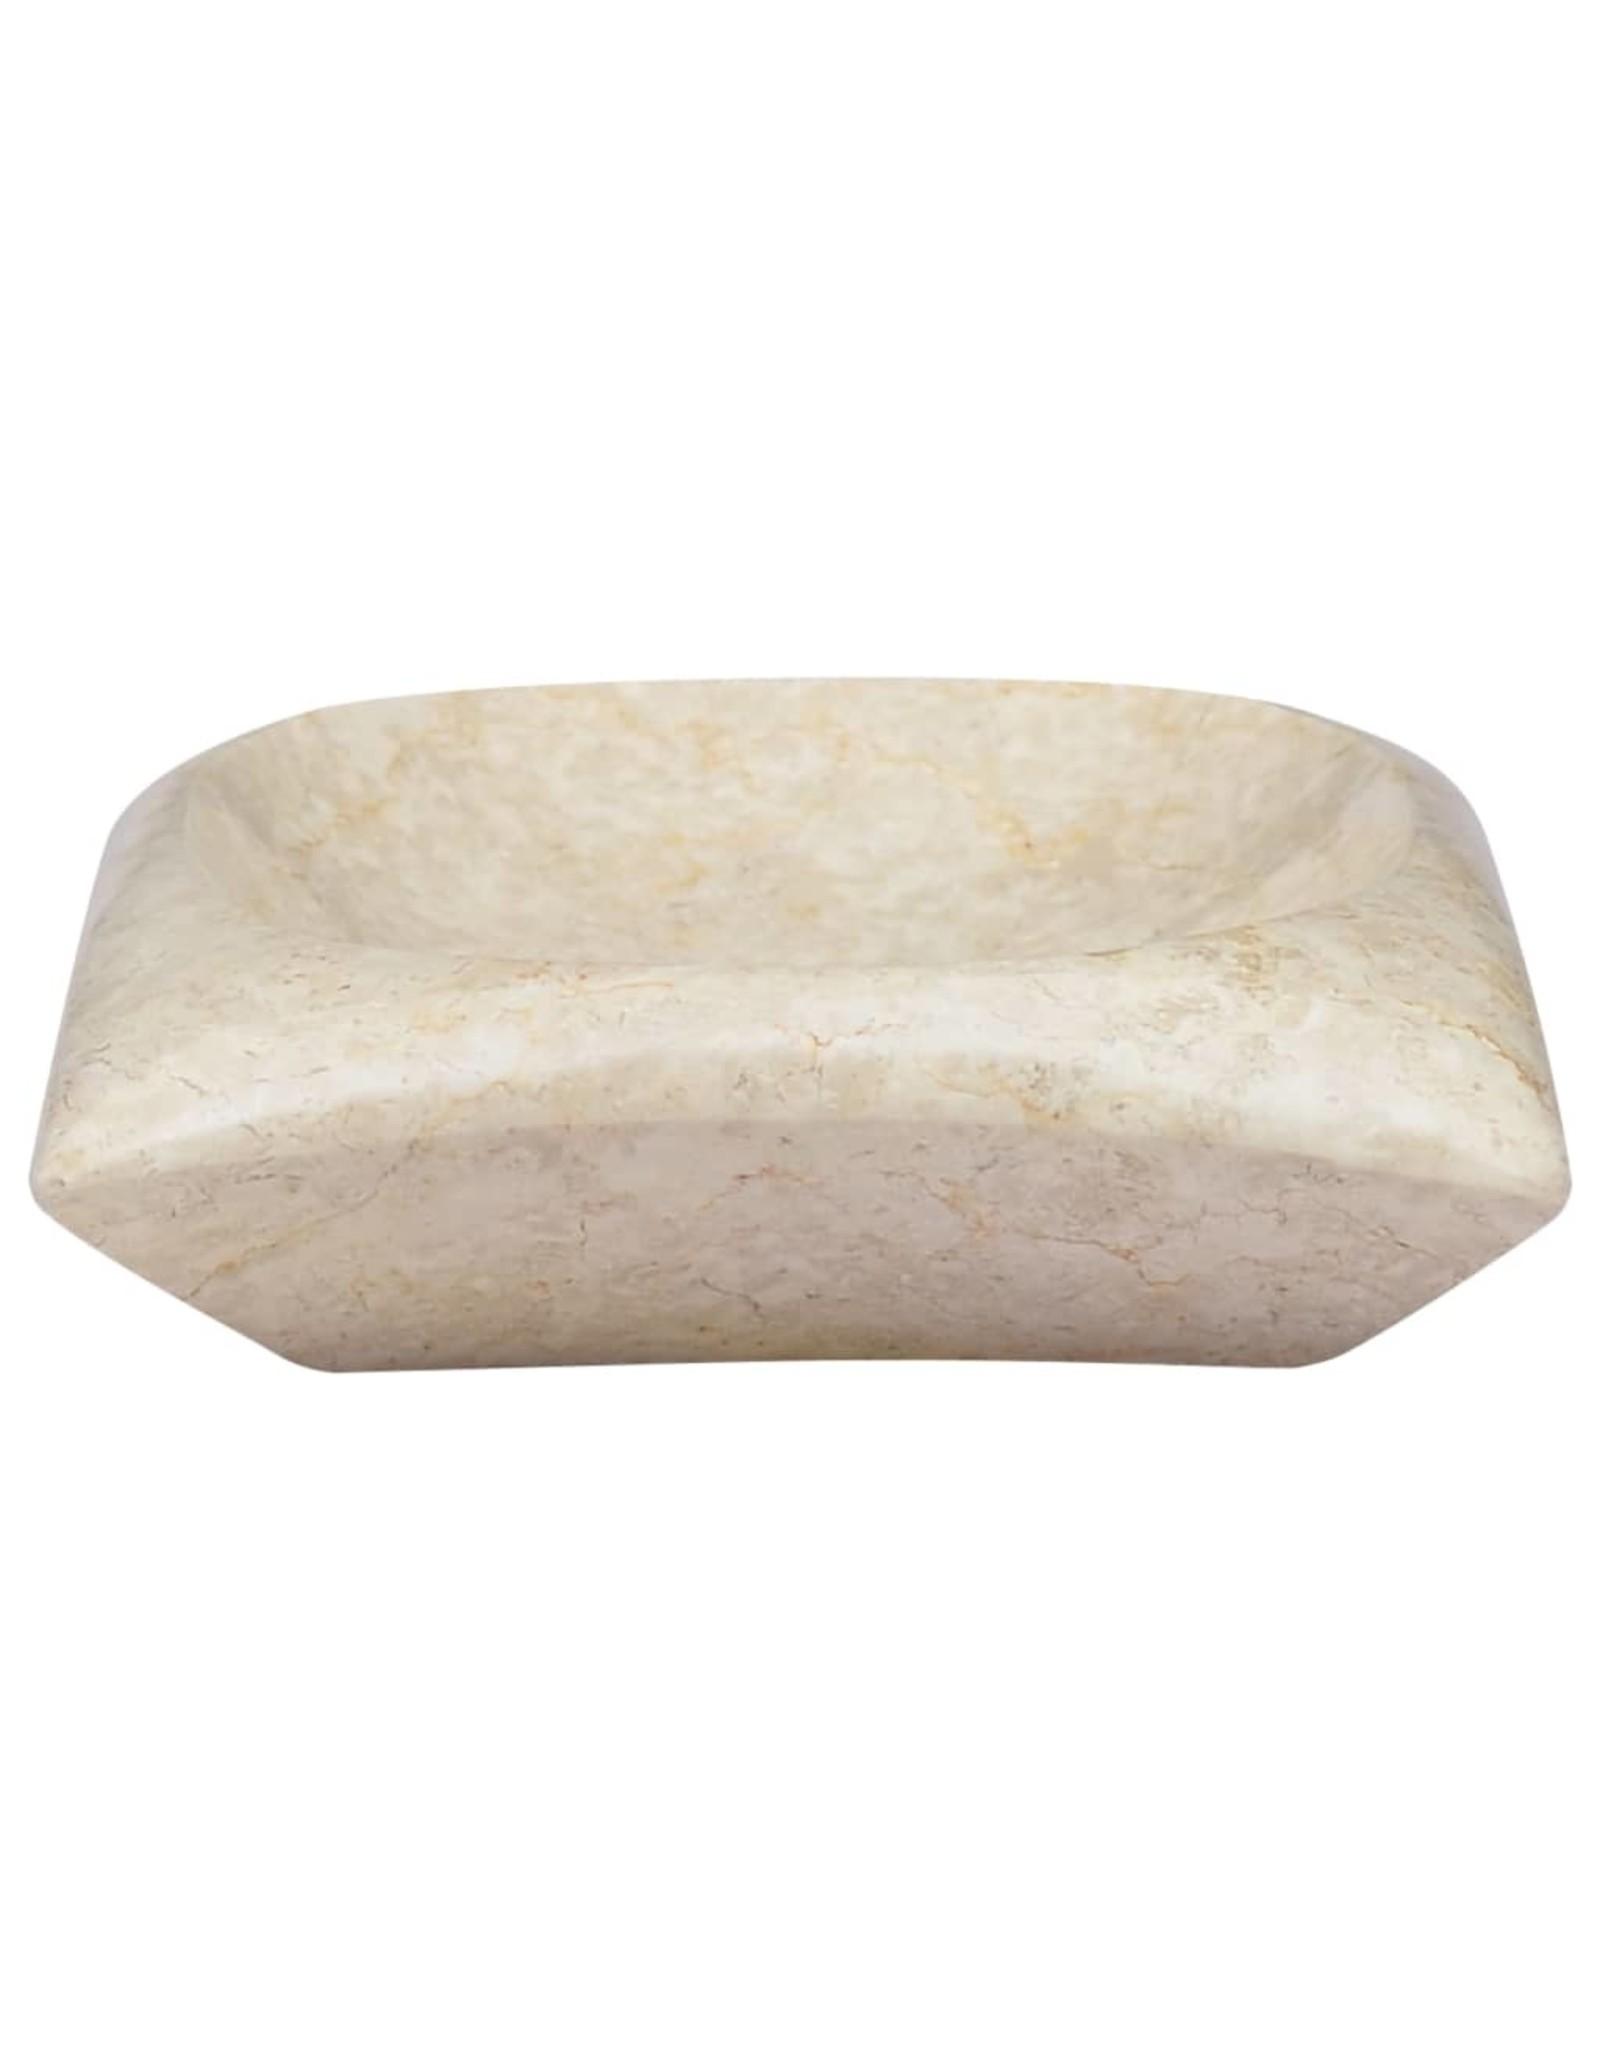 Gootsteen 50x35x10 cm marmer crèmekleurig